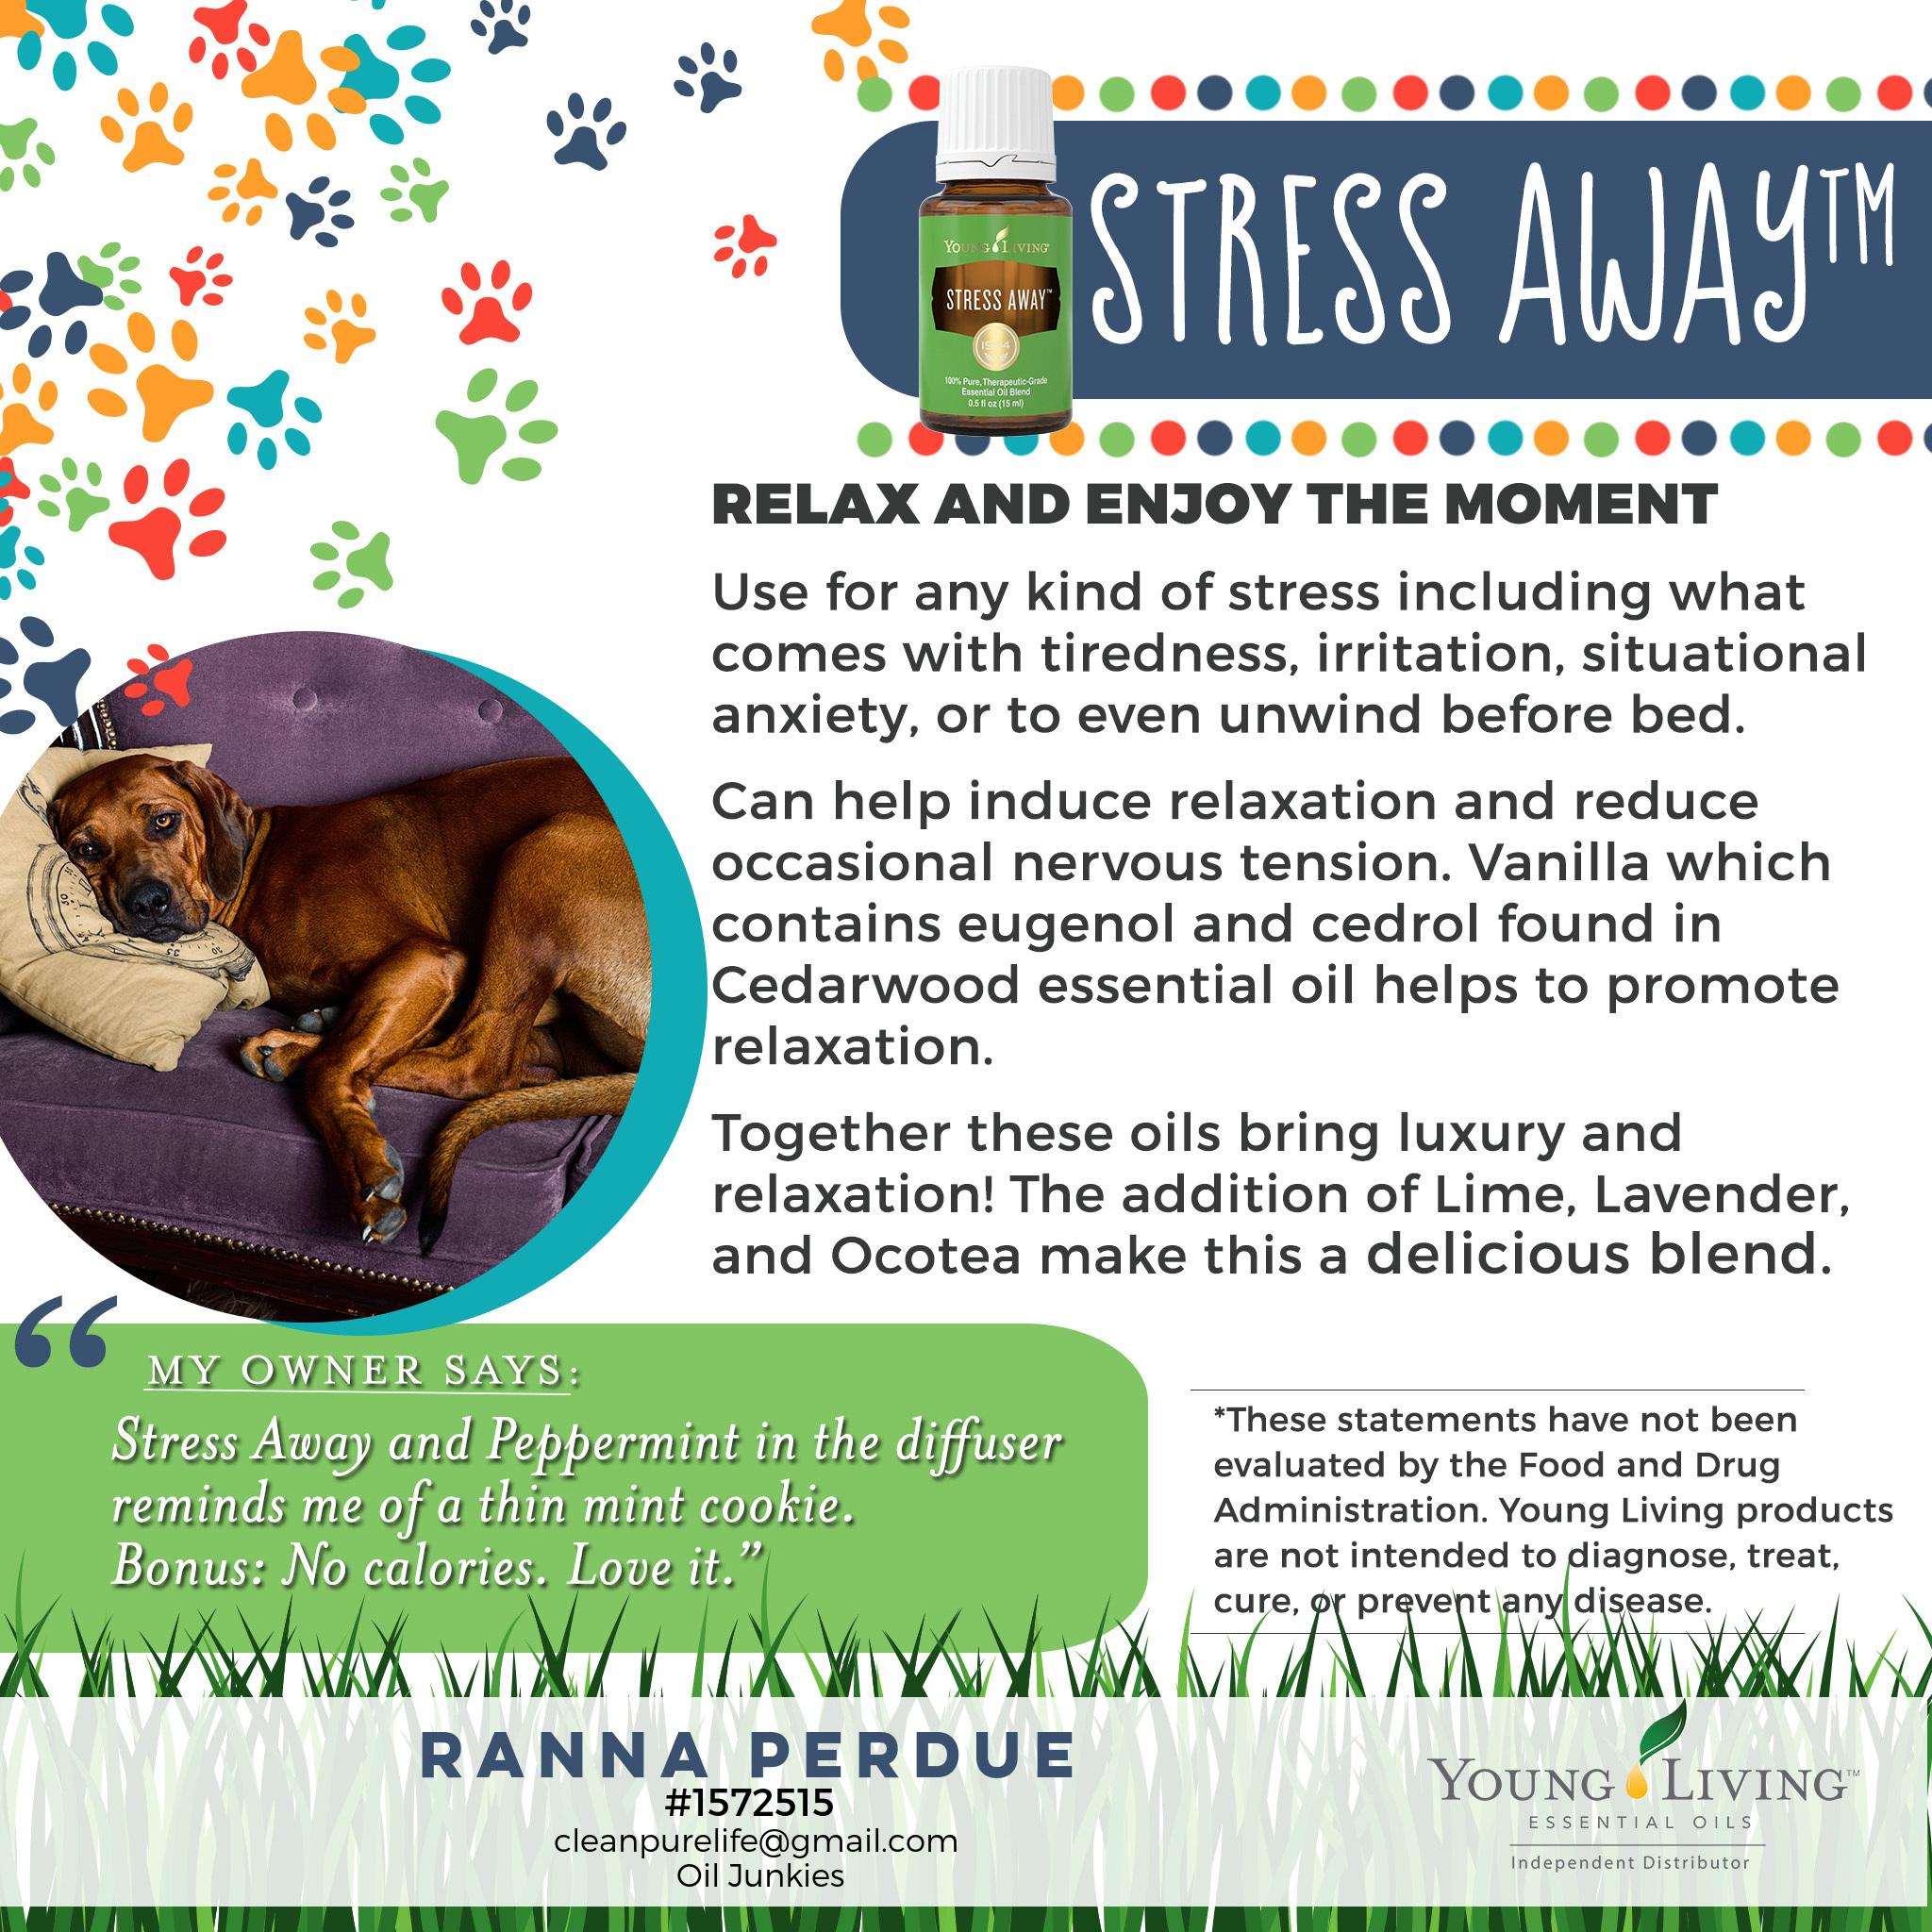 16-Dogs-Stress-Away